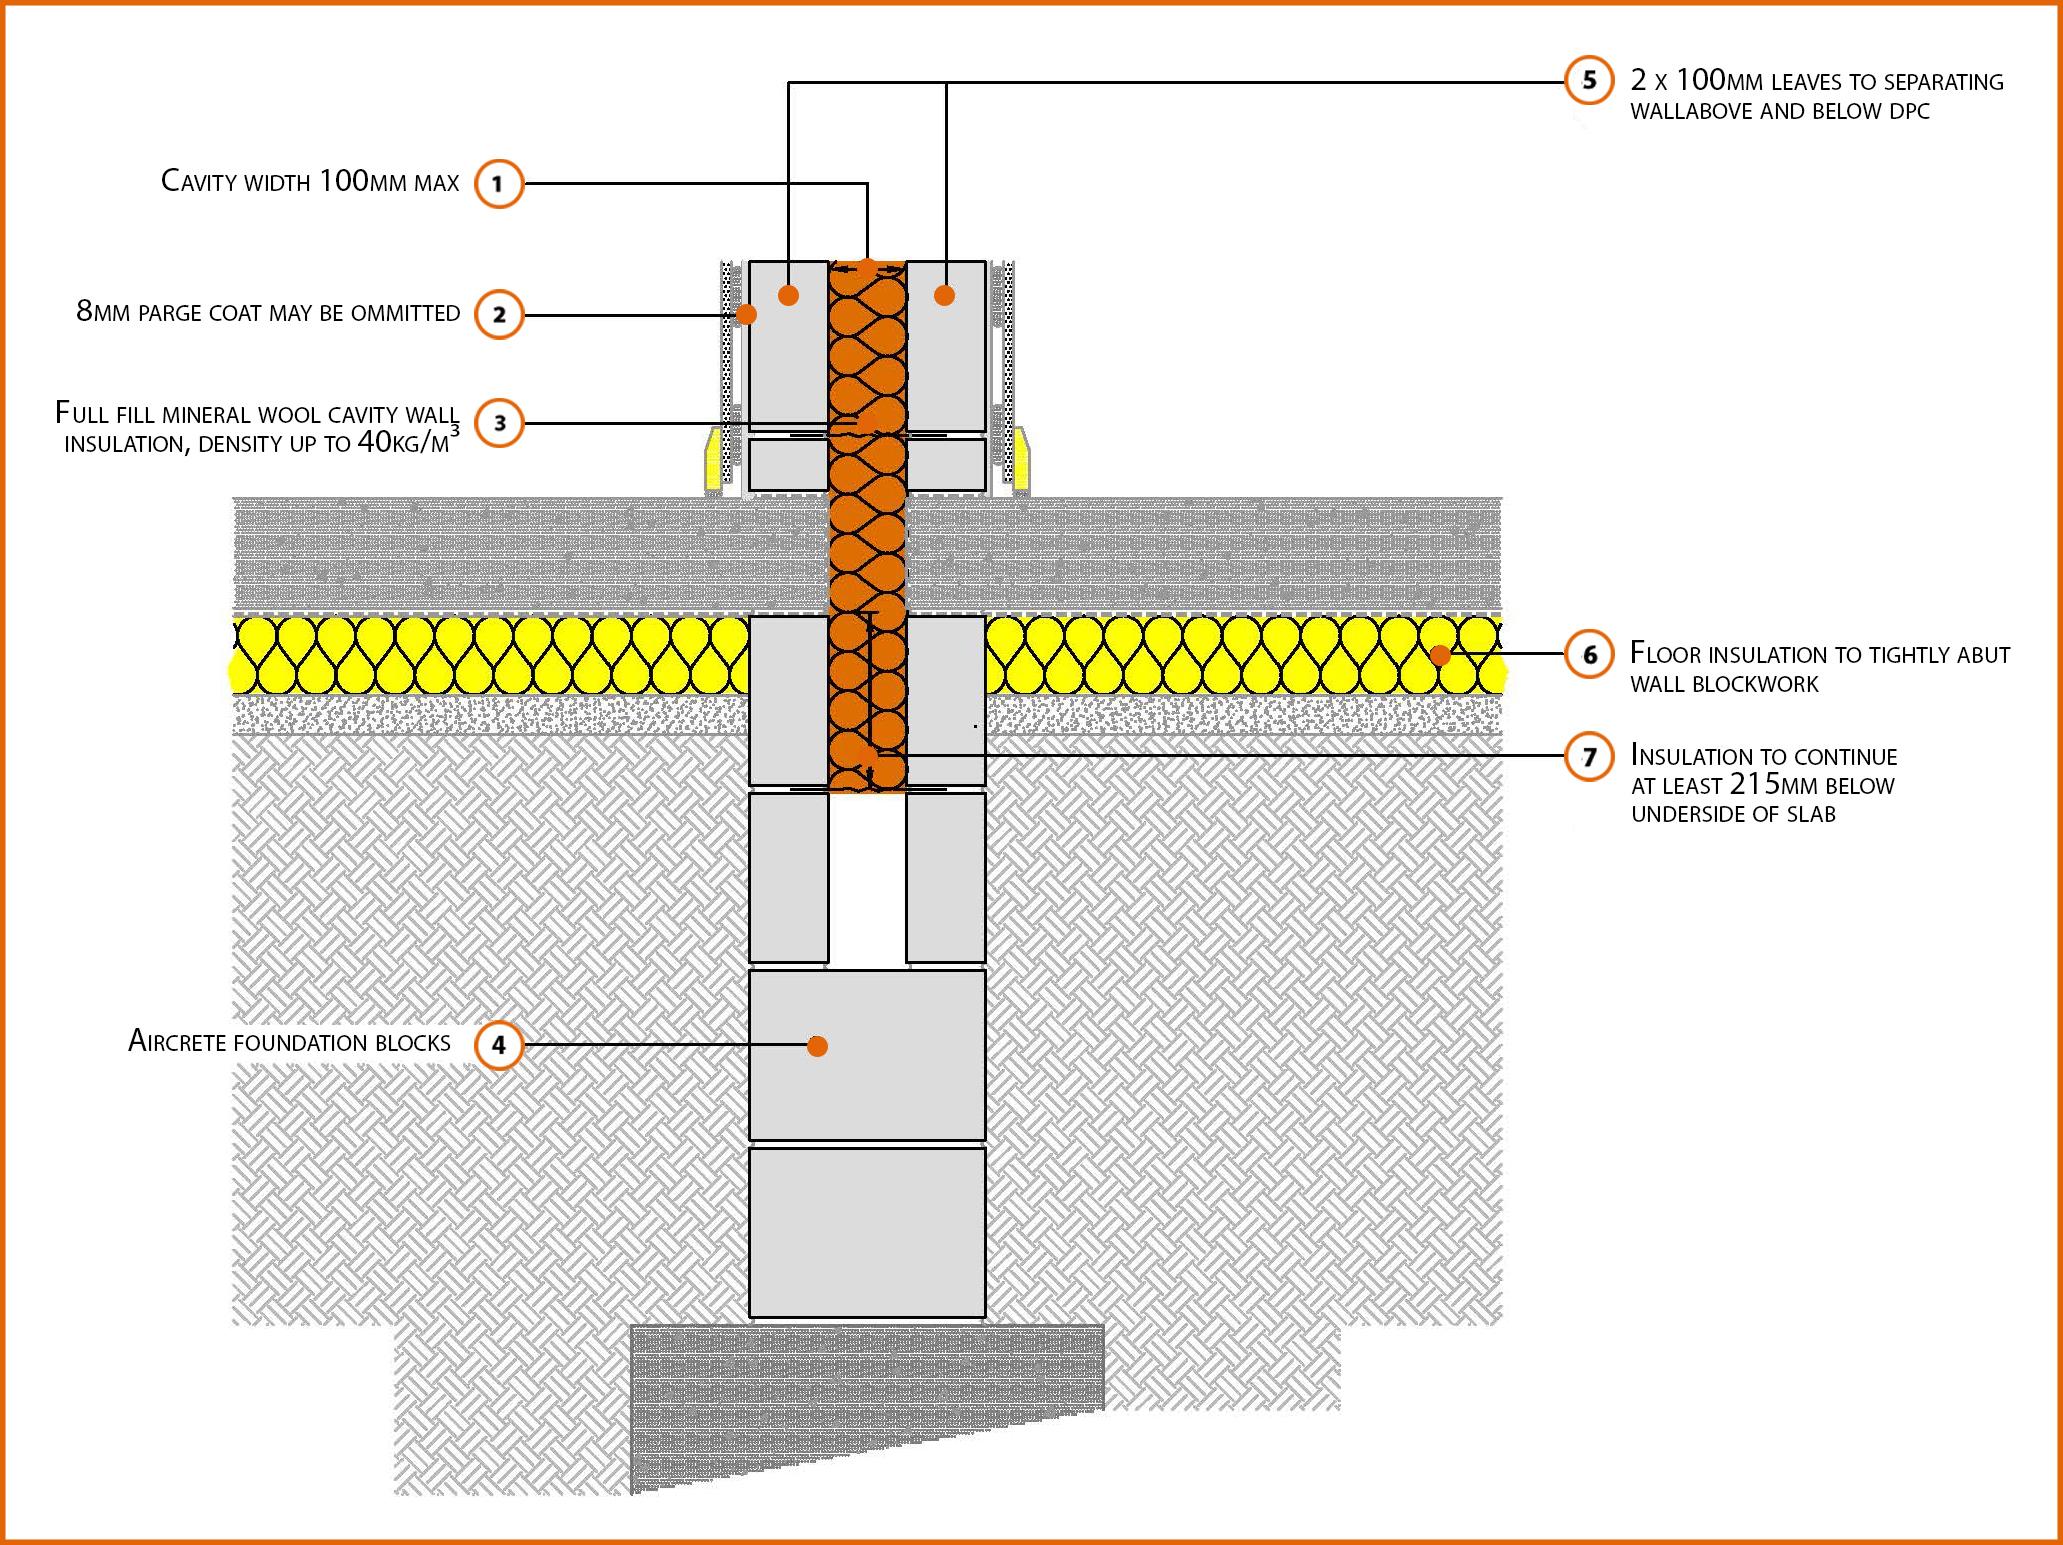 P1pcff4 Suspended Concrete Floor Insulation Below Slab